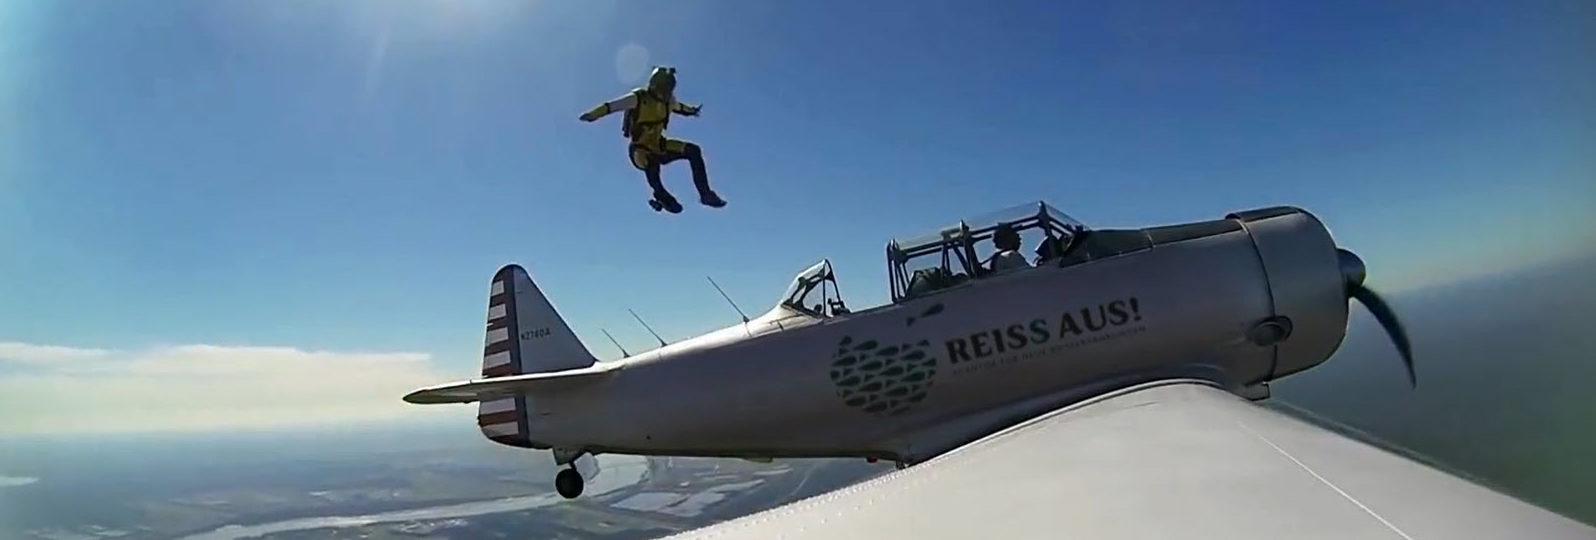 Skydiving mit REISS AUS!